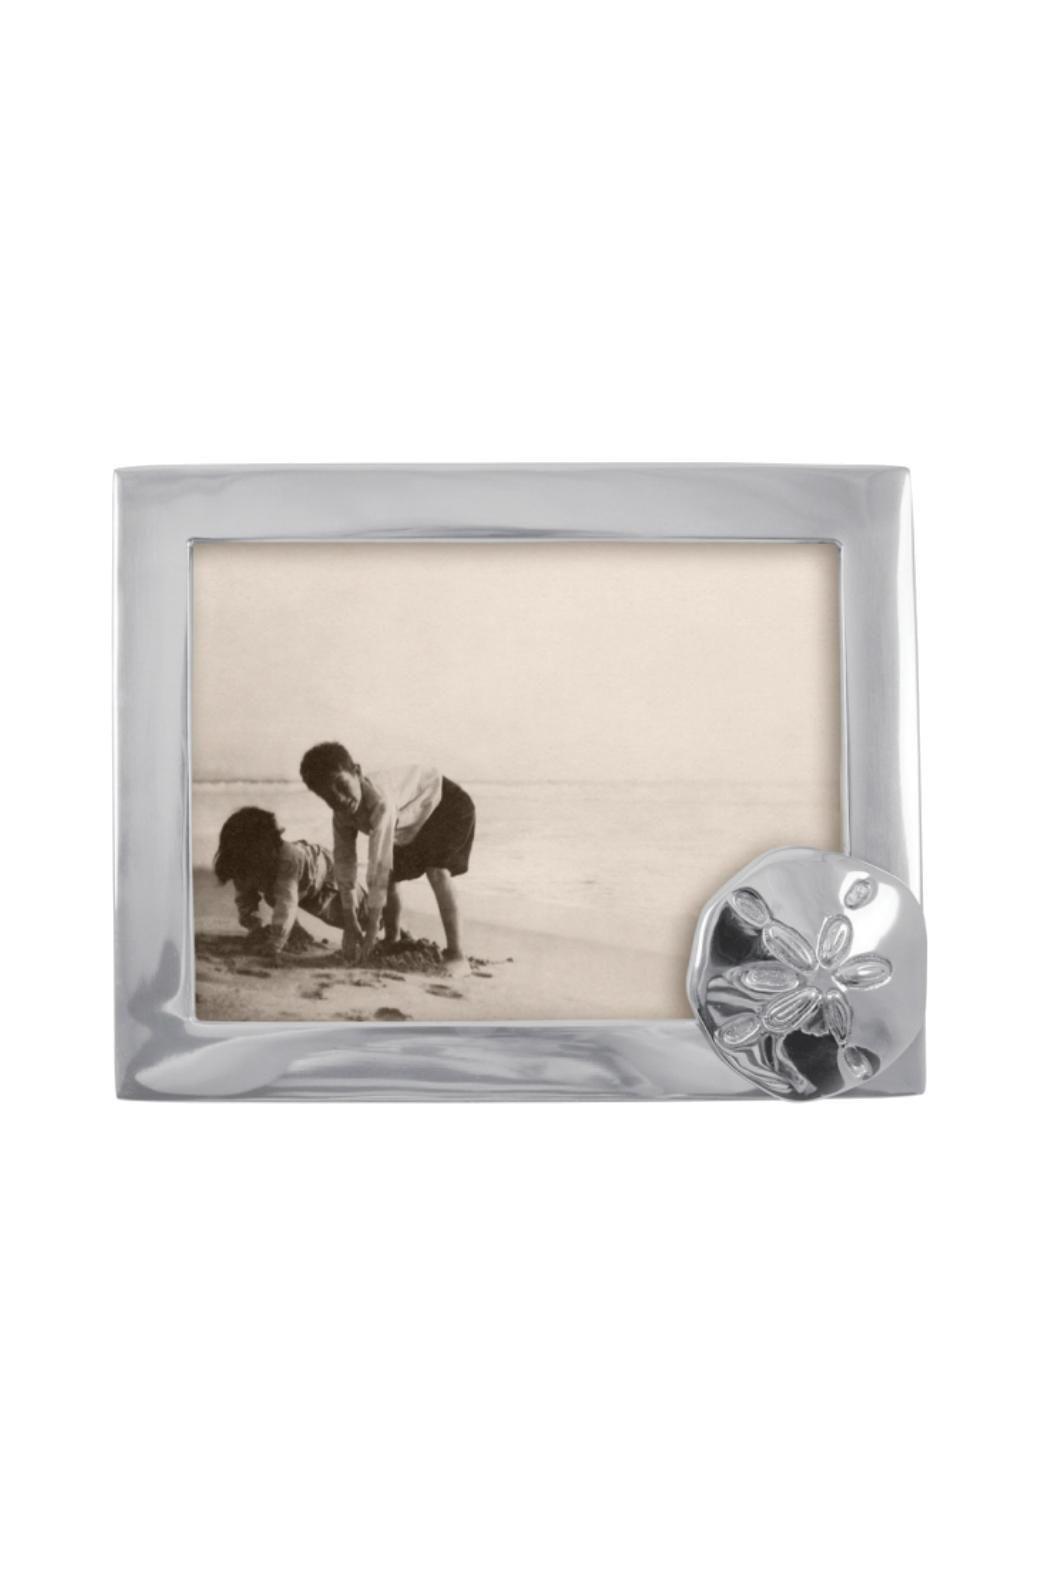 mariposa sand dollar 5x7 frame - Dollar Frames